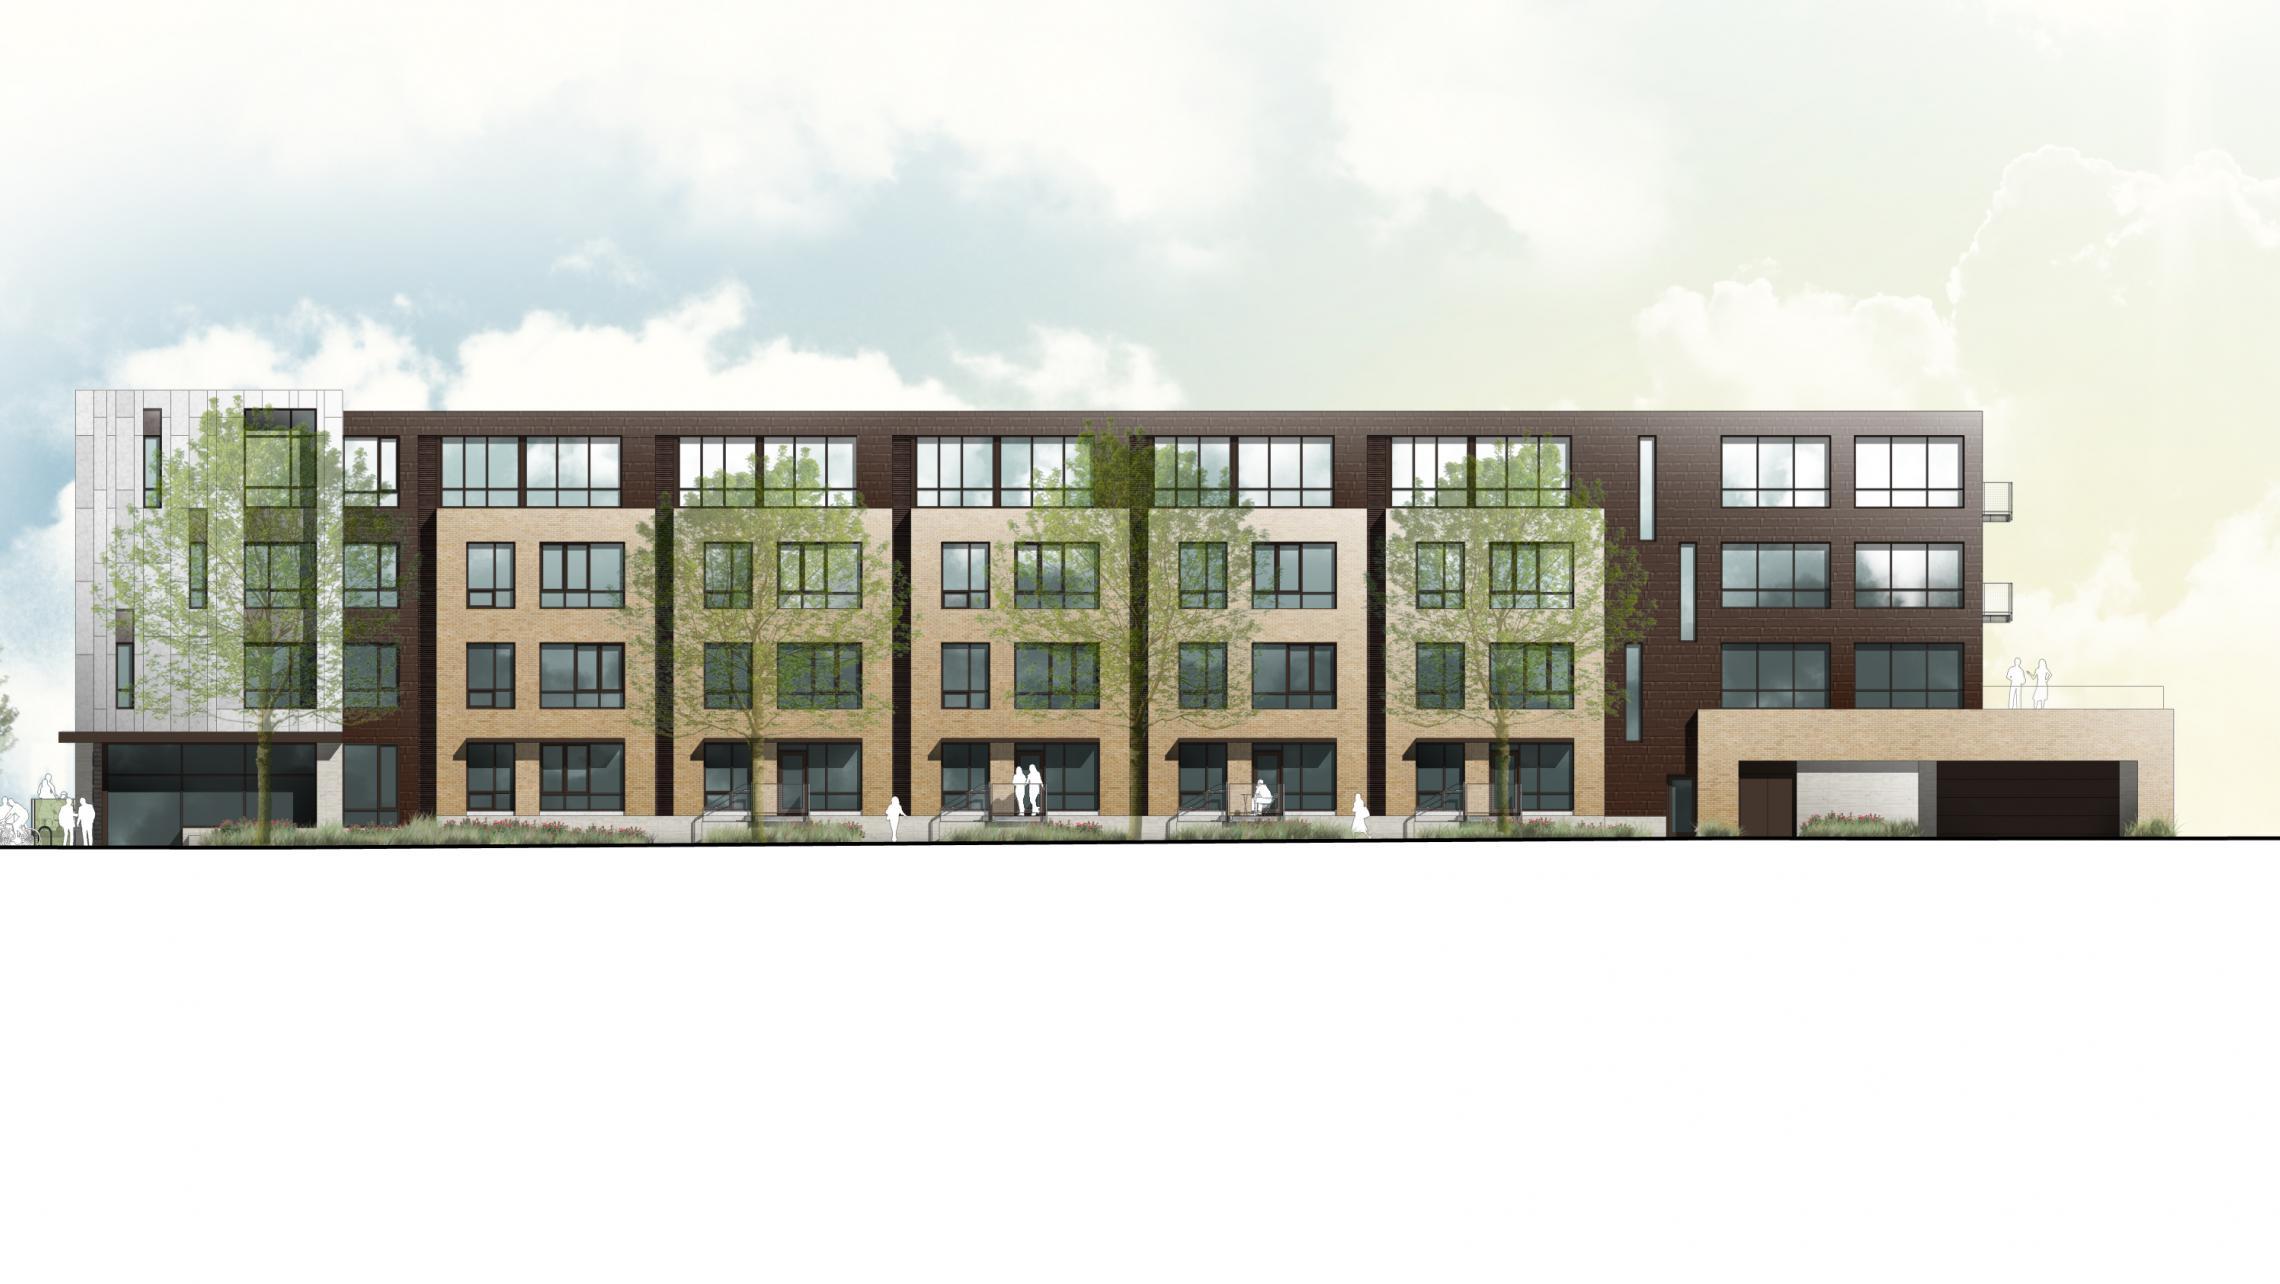 ULI Quarter Row - Doty Street Rendering